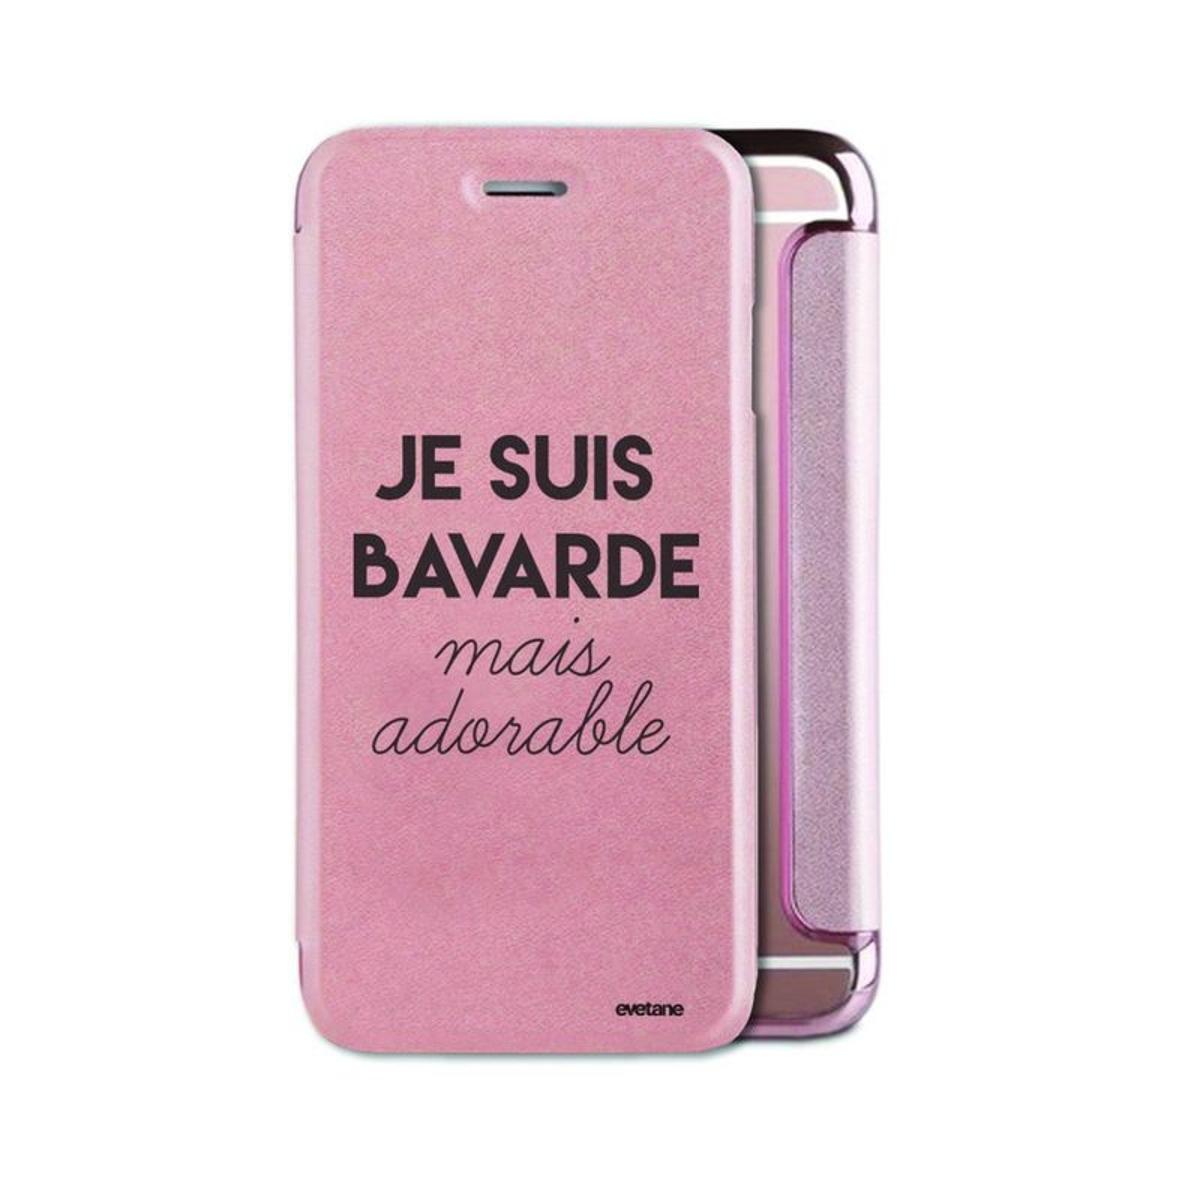 Etui iPhone 6 iPhone 6S souple rose gold, Bavarde Mais Adorable, Evetane®